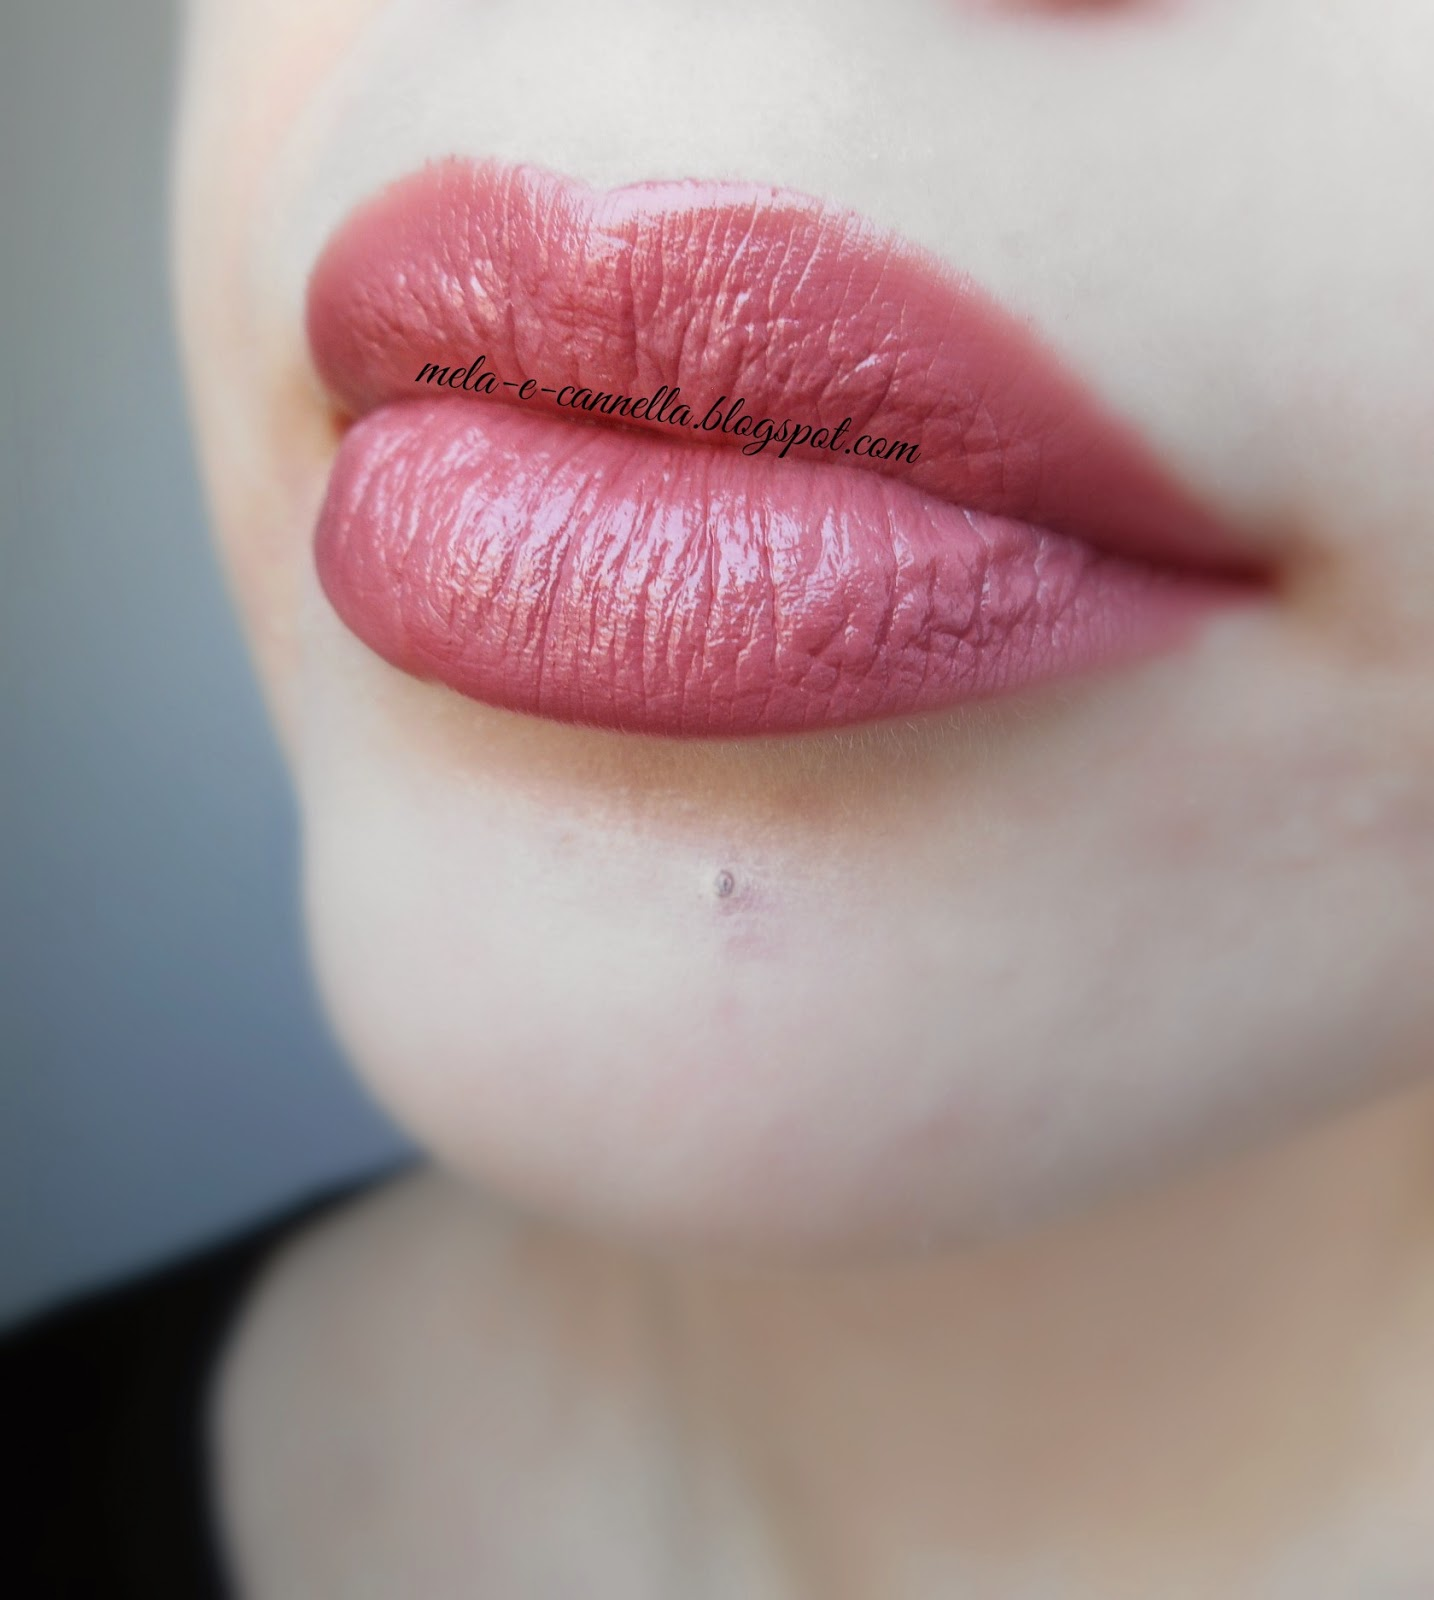 Mela E Cannella Avon Ultra Colour Indulgence Lipstick Tawny Rose